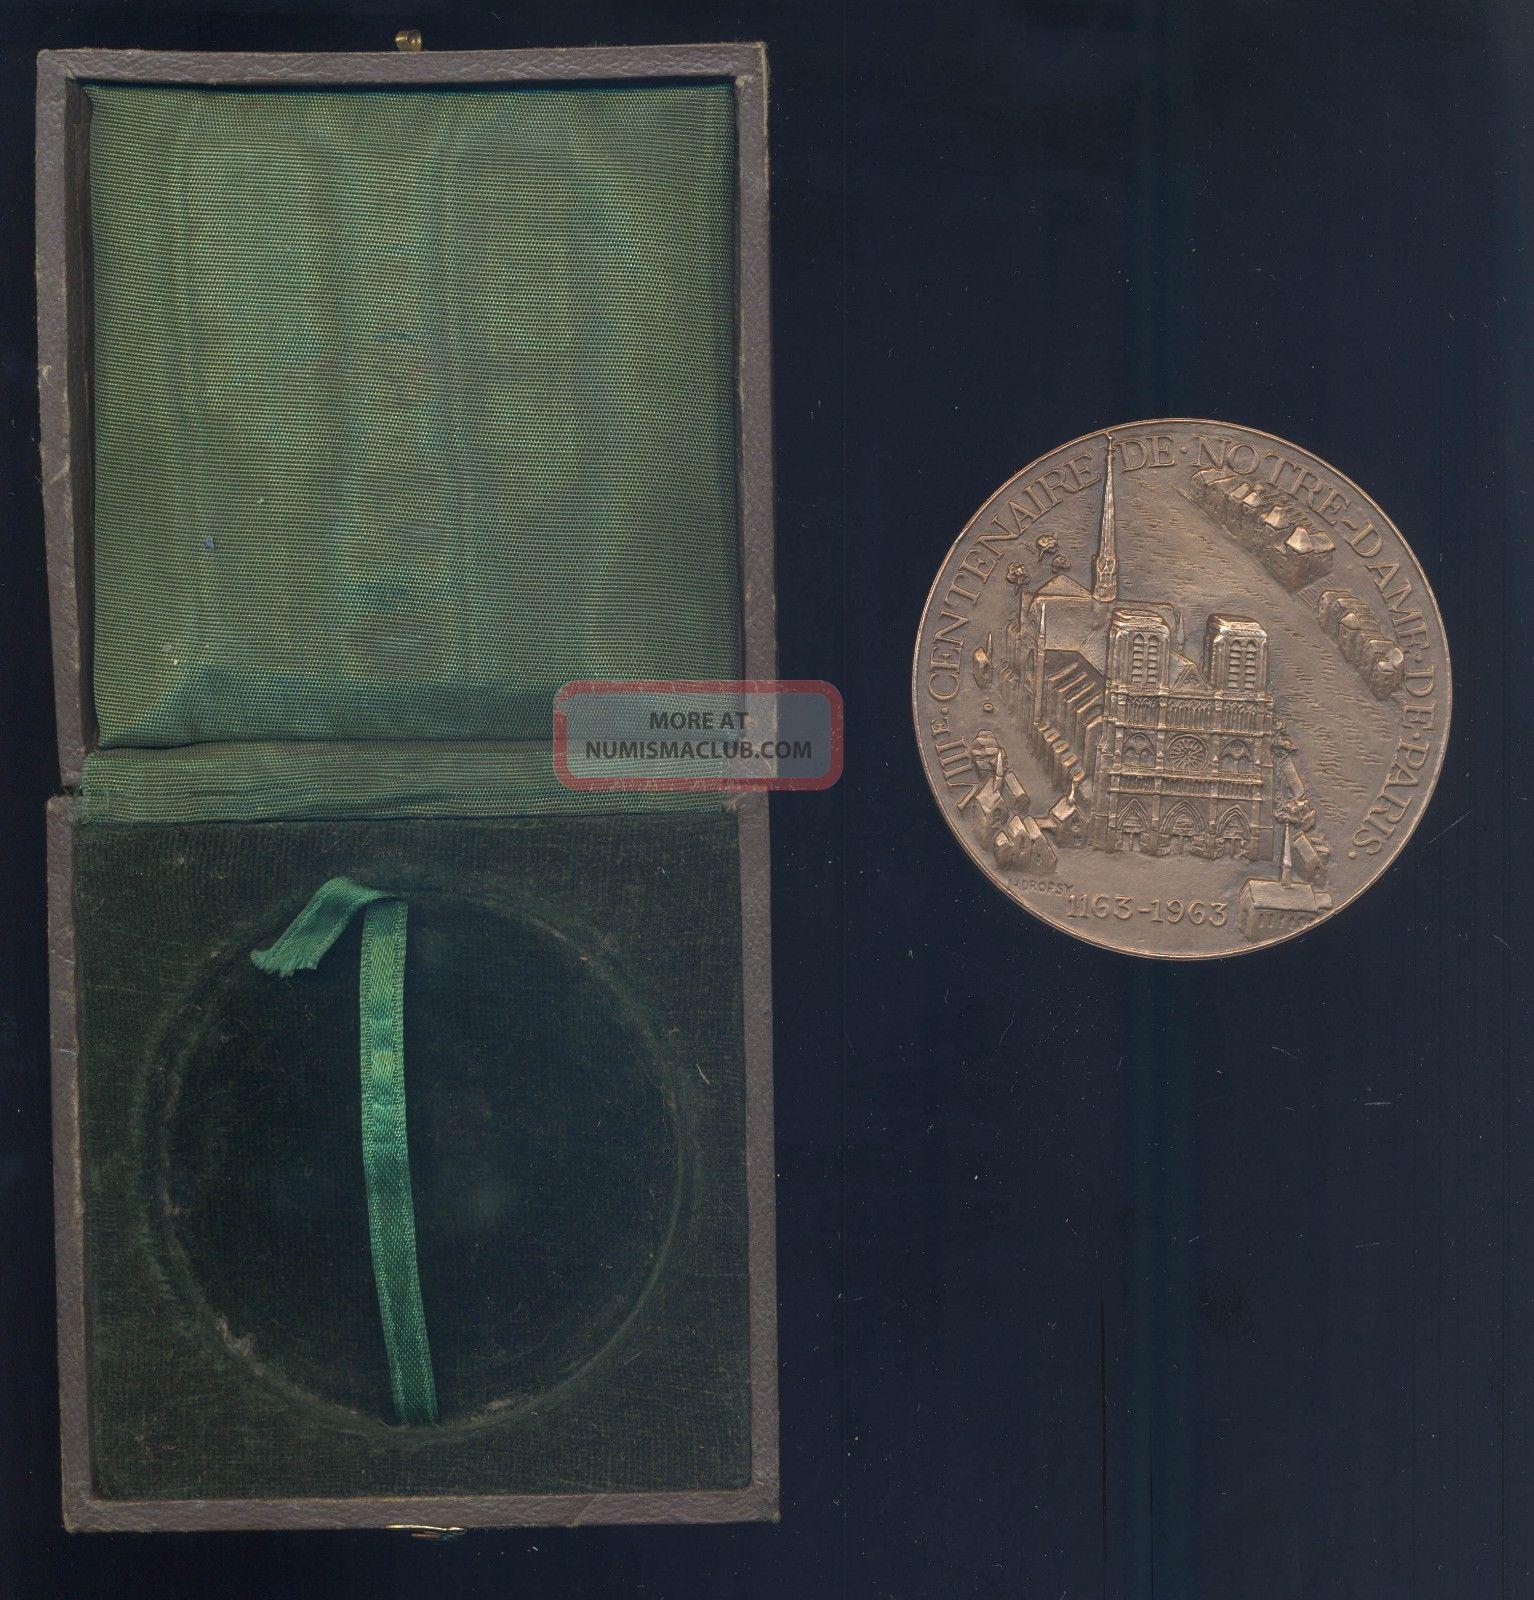 France Art Deco Notre Dame Paris Size Medal By Dropsy Christian Exonumia photo